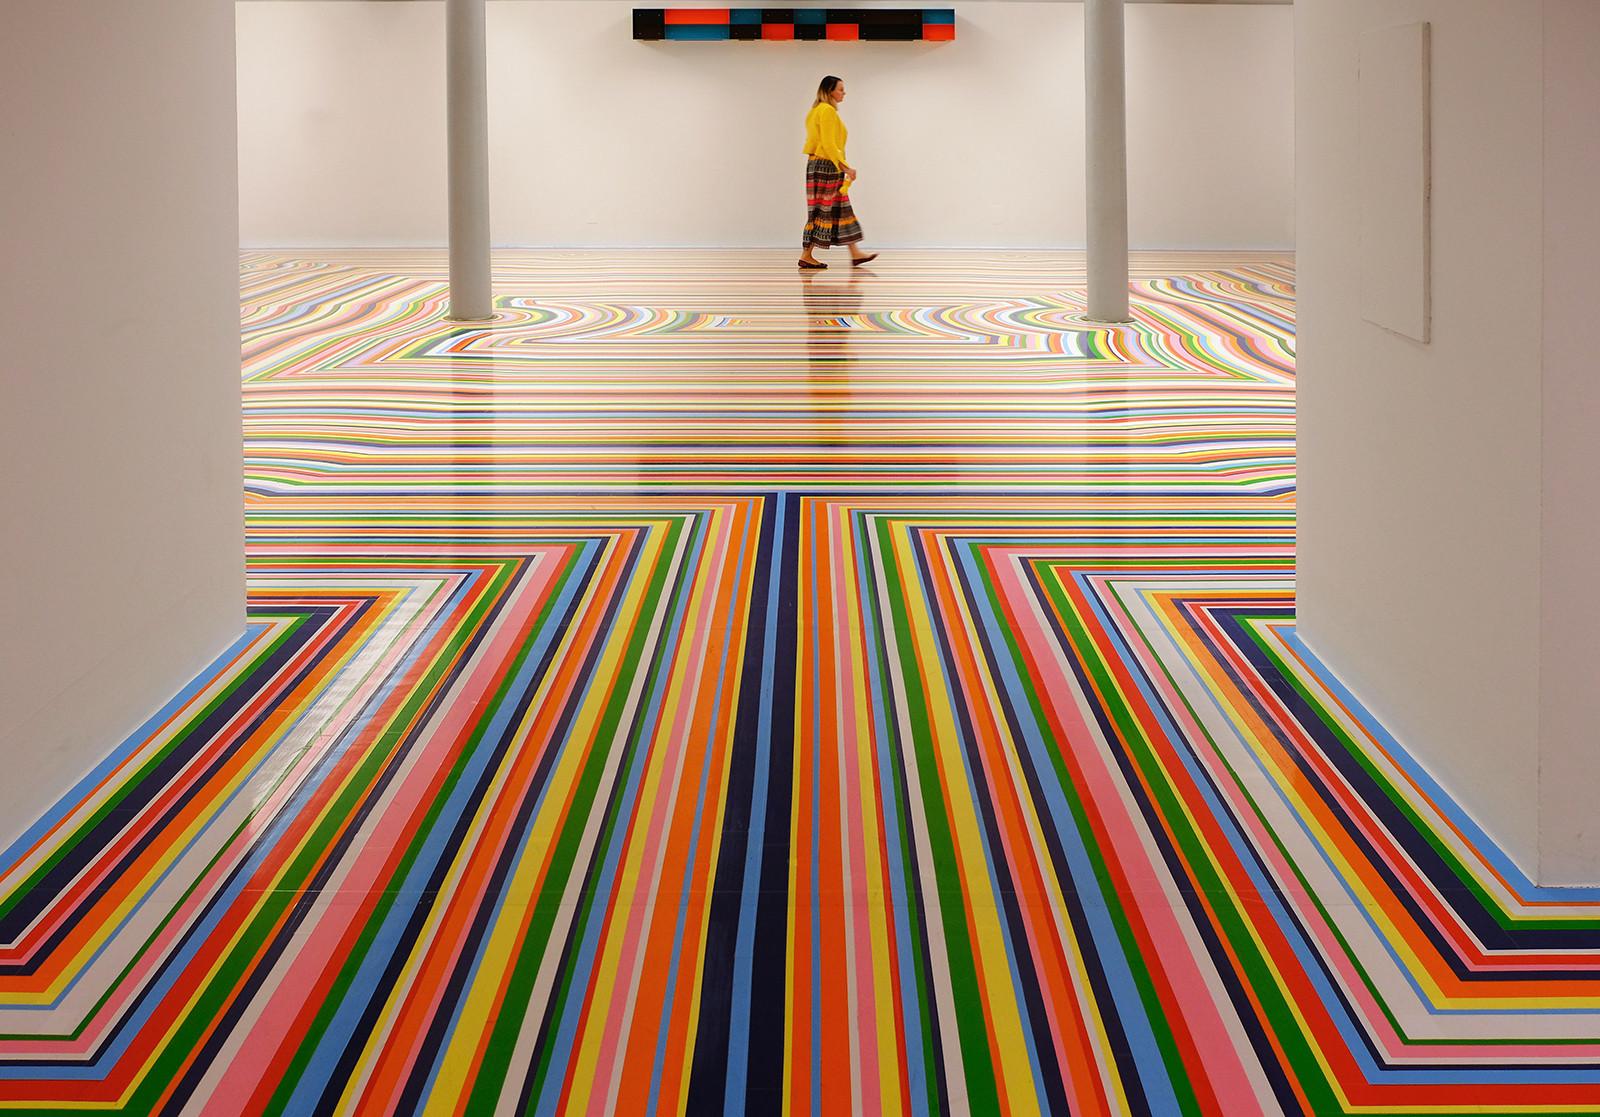 PDI - Stripes by Brian Mason (10.5 marks)